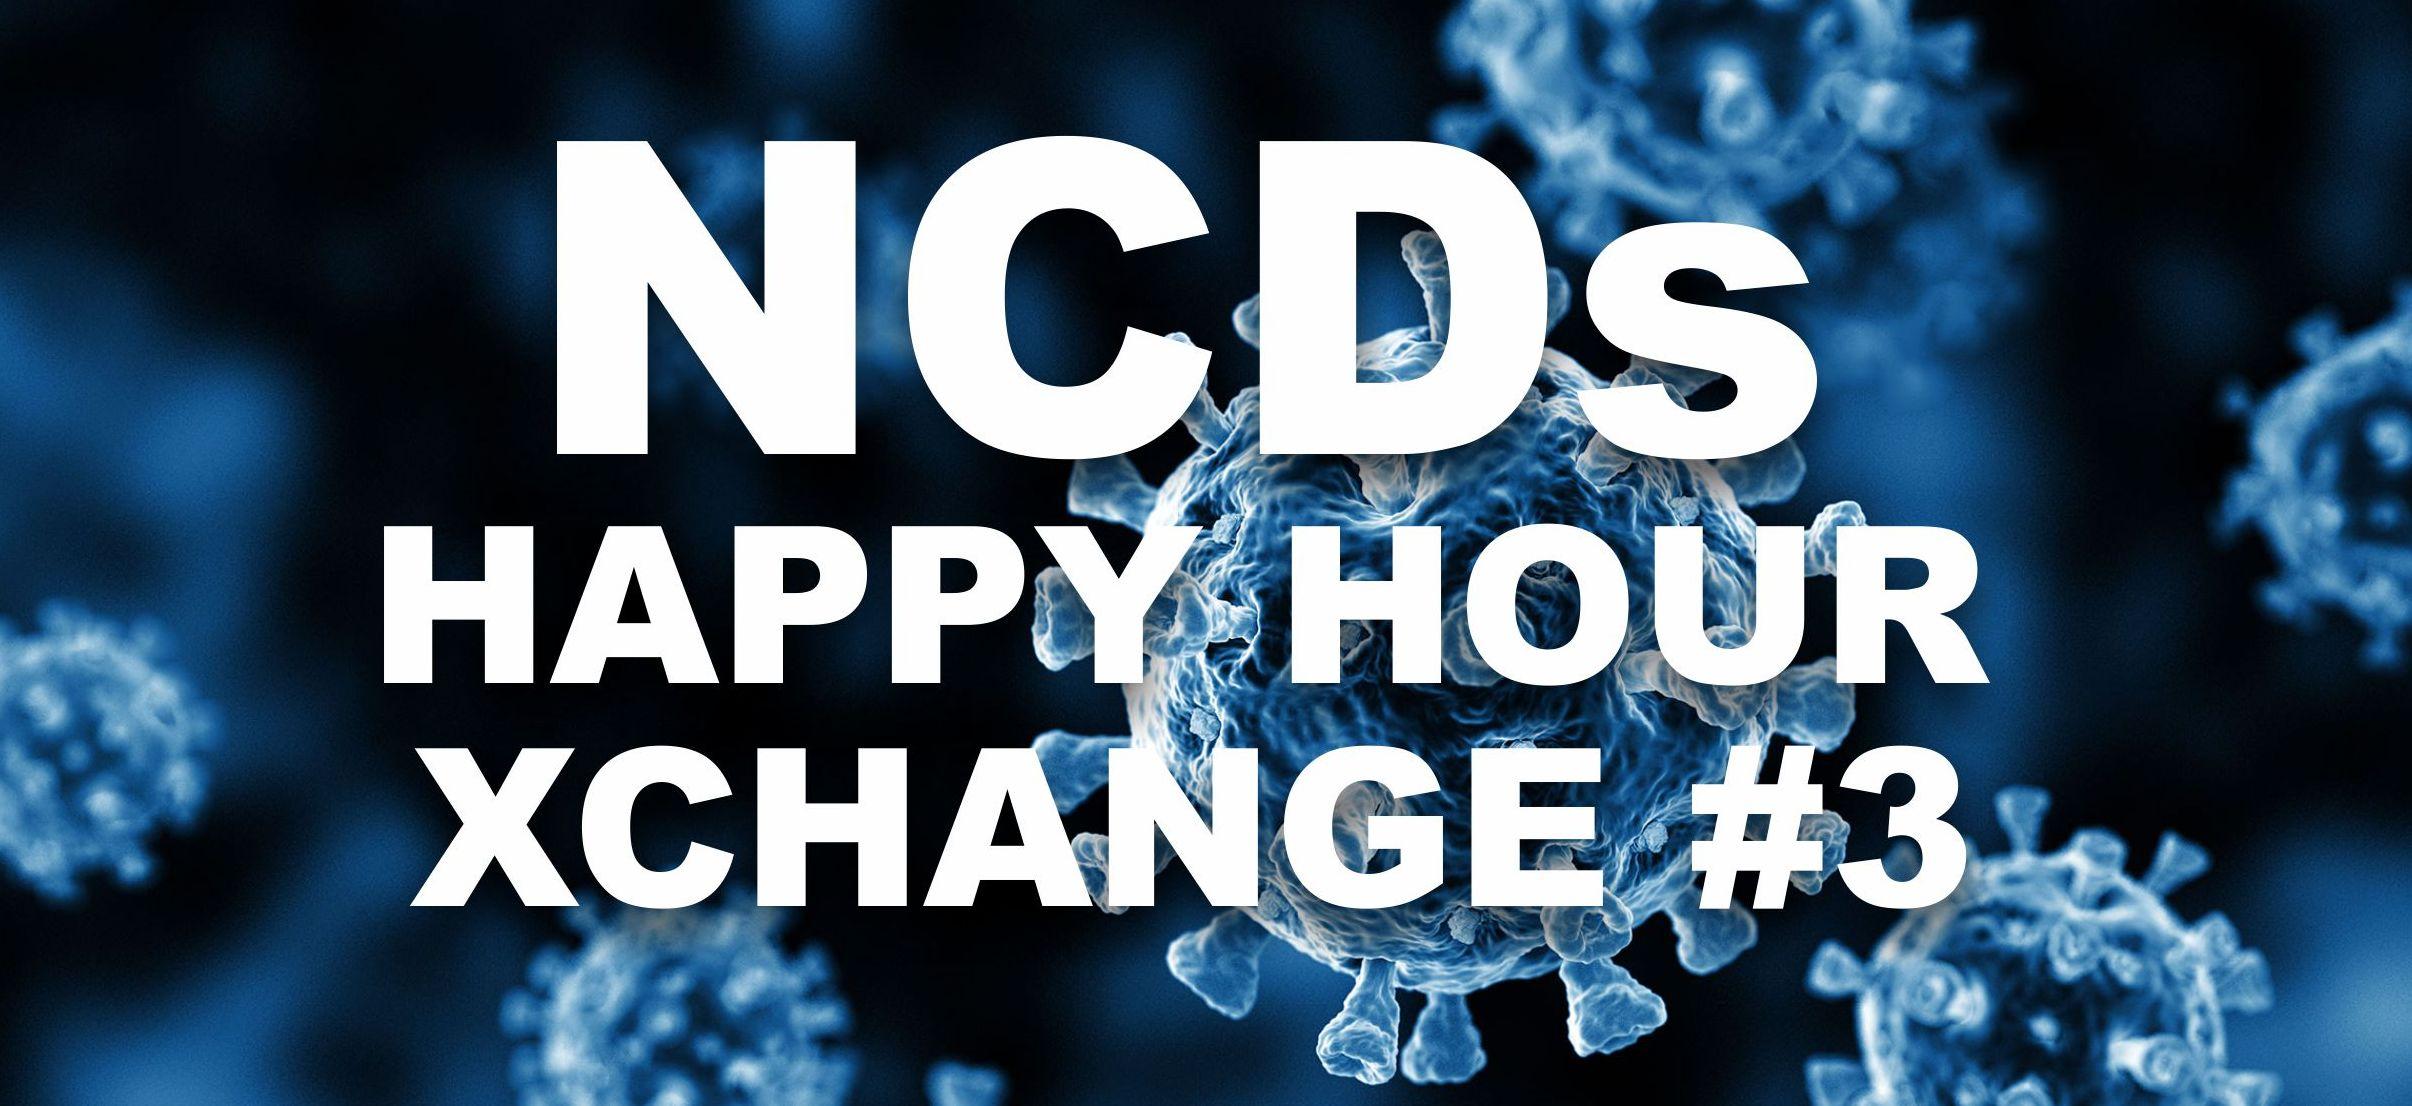 3rd Happy Hour Xchange With SANCDA